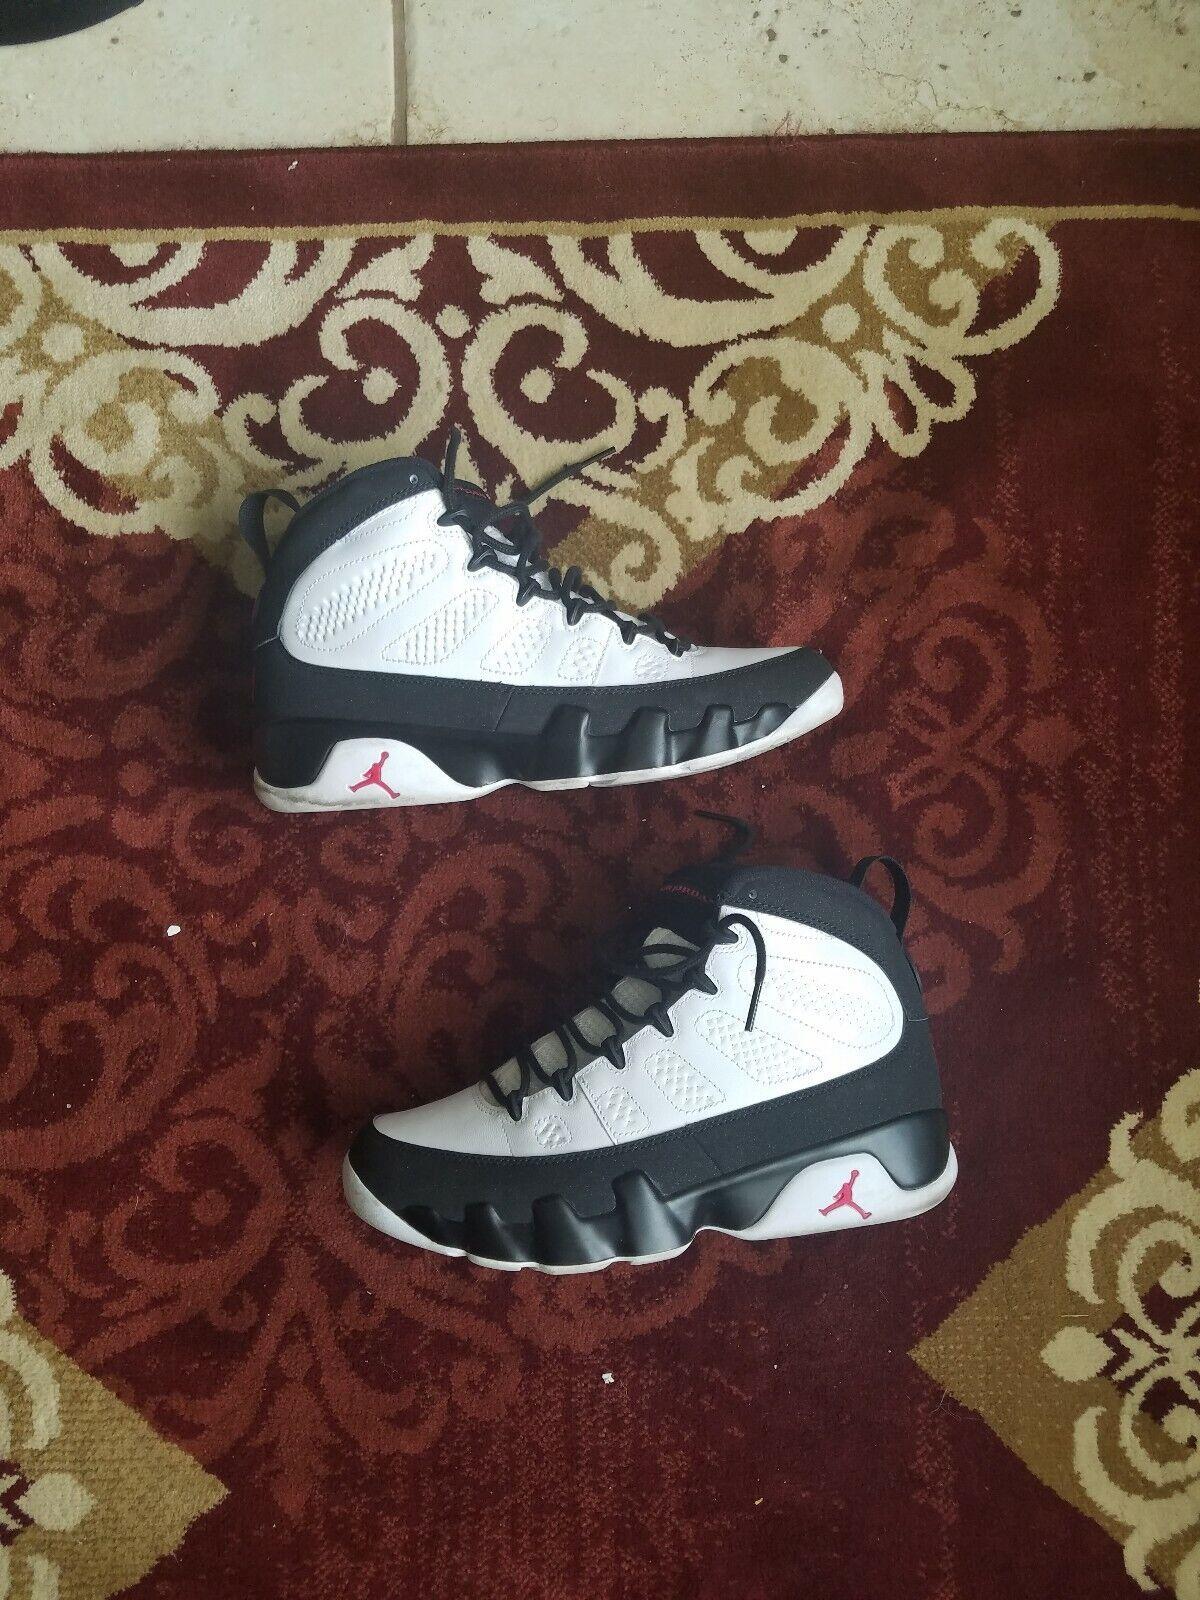 2016 Nike Air Jordan IX Retro 9 OG Space Jam White Black Red AUTHENTIC Size 9